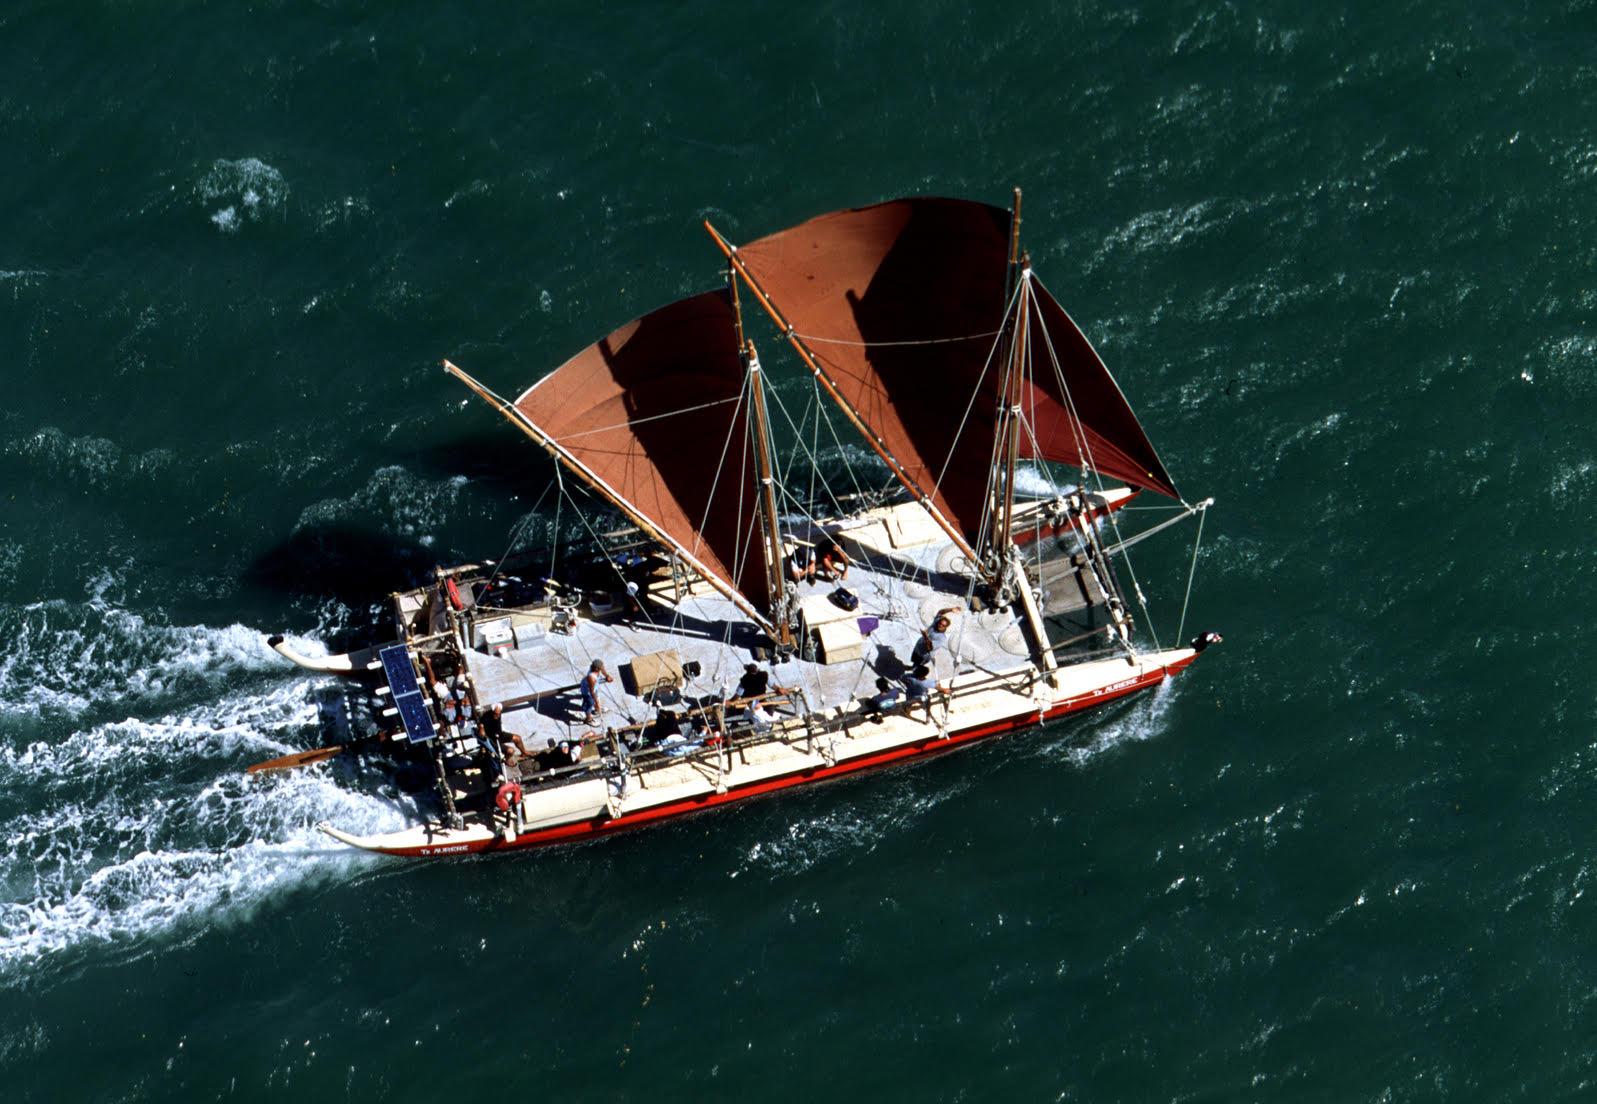 Okeanos Foundation for the Sea sailing canoes